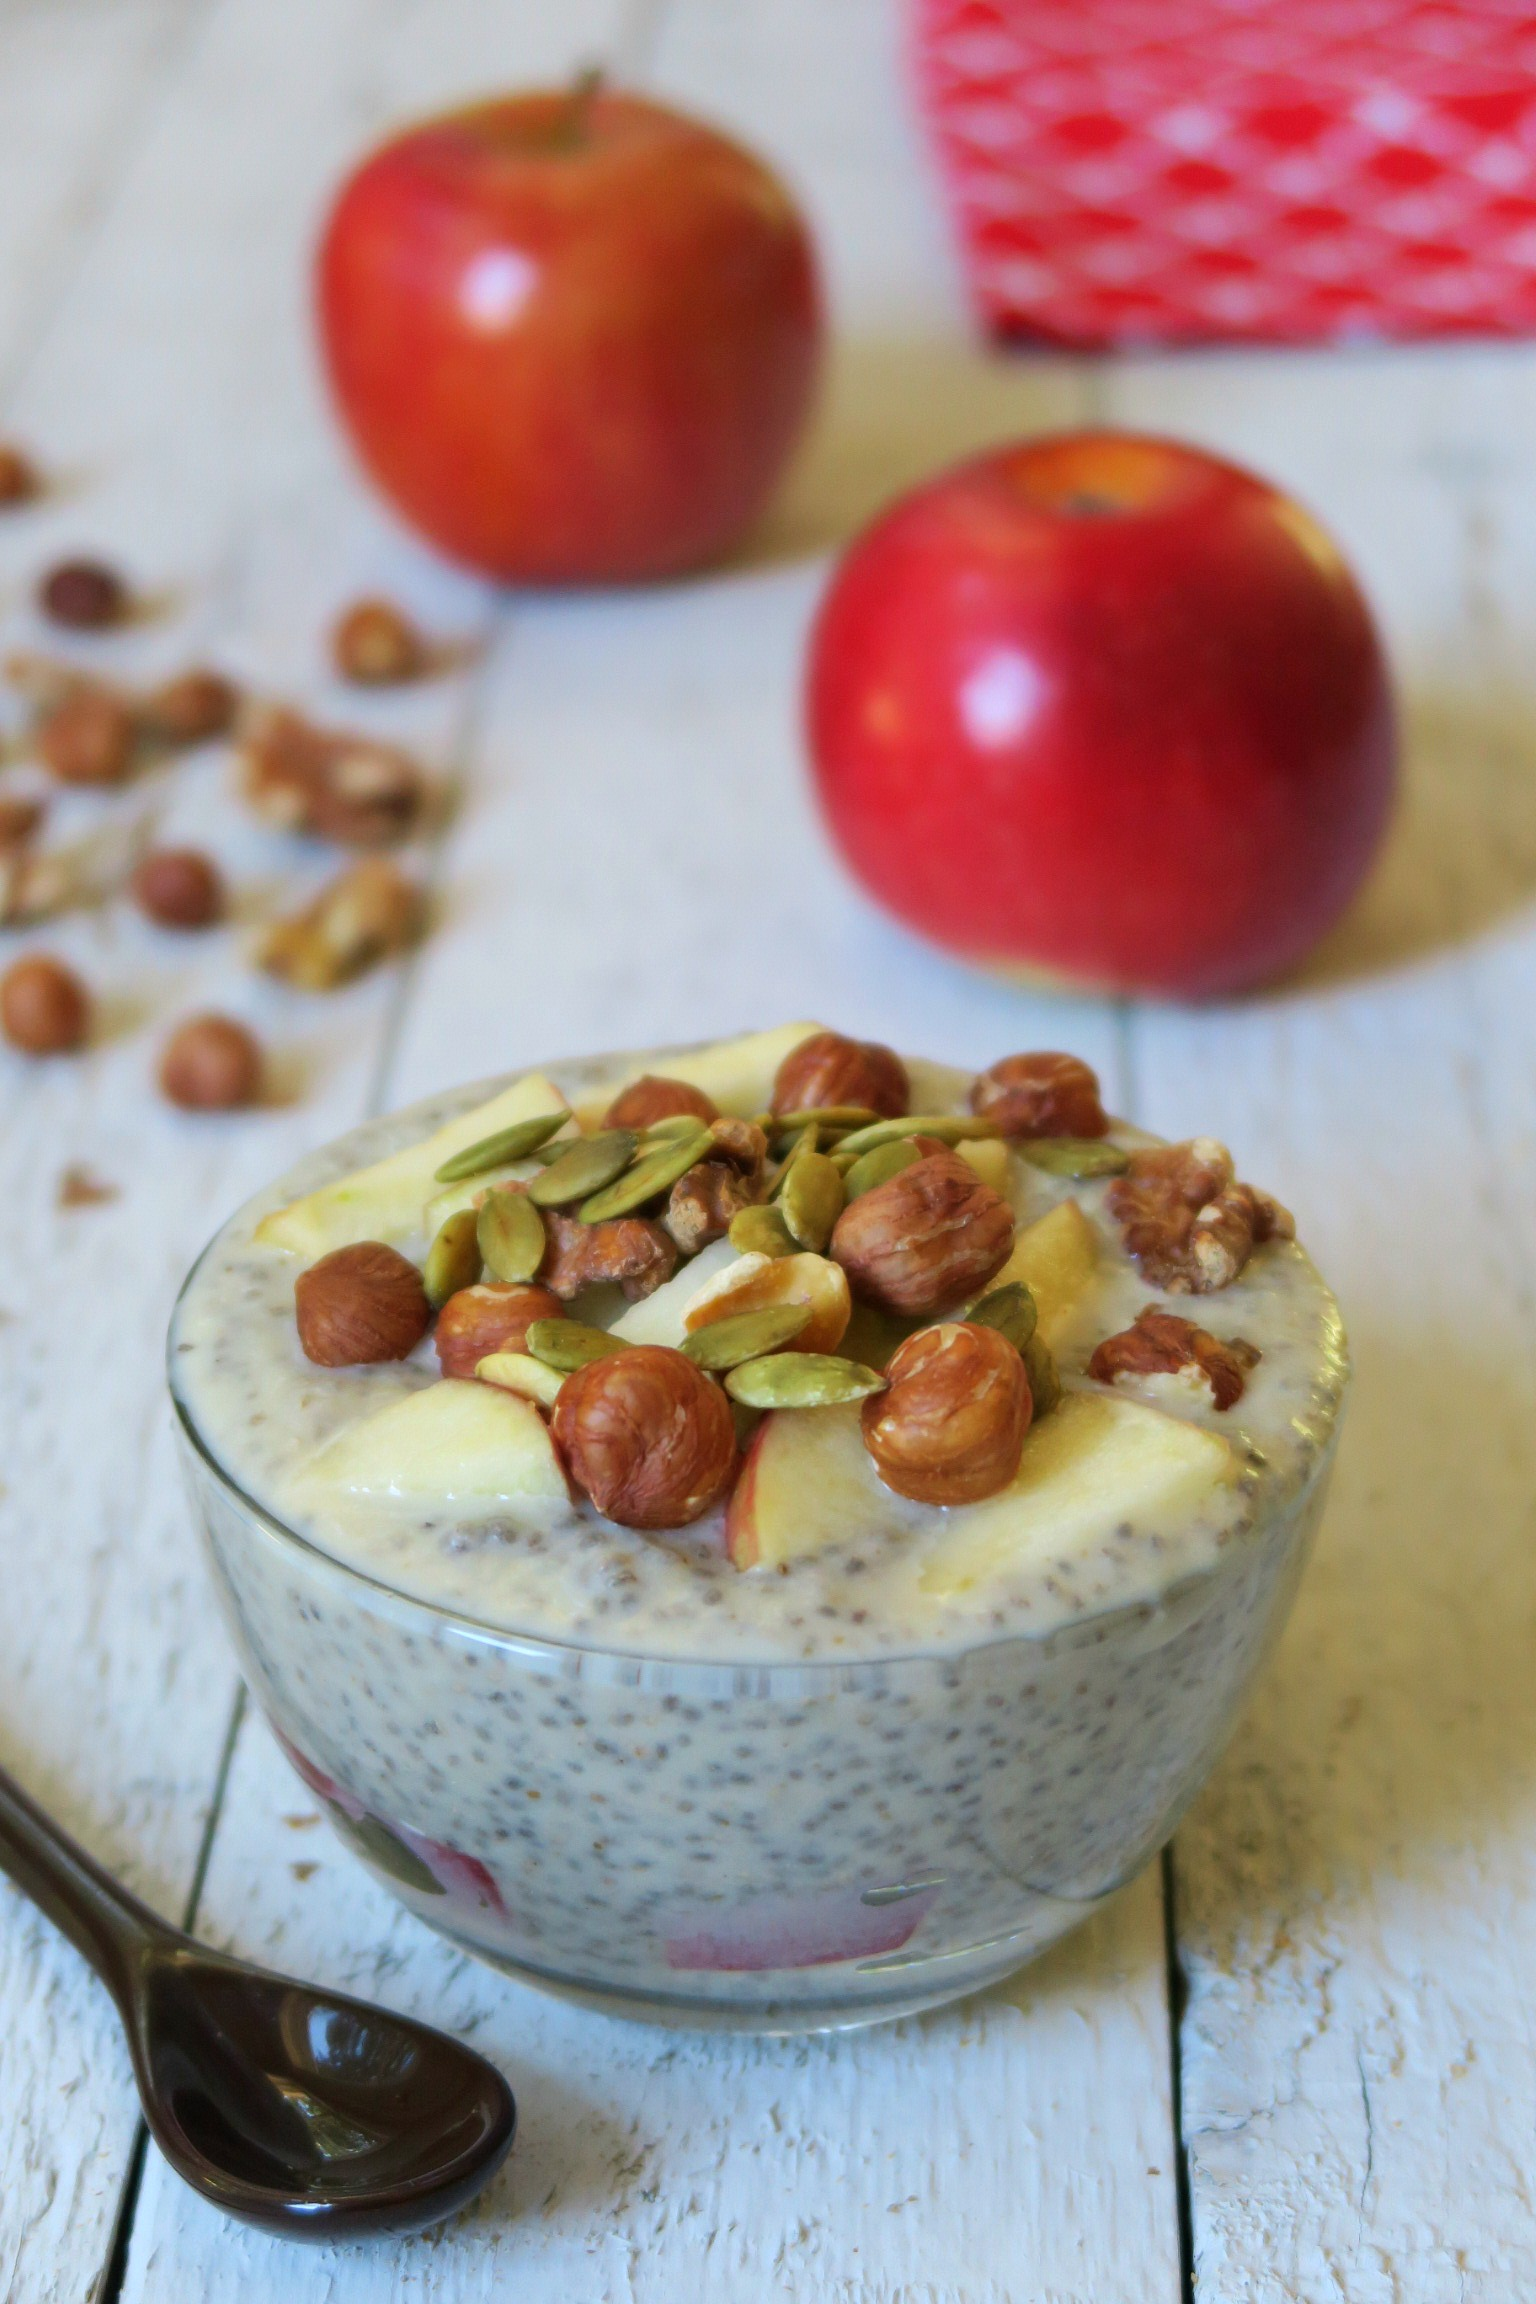 apple-chia-pudding2.jpg